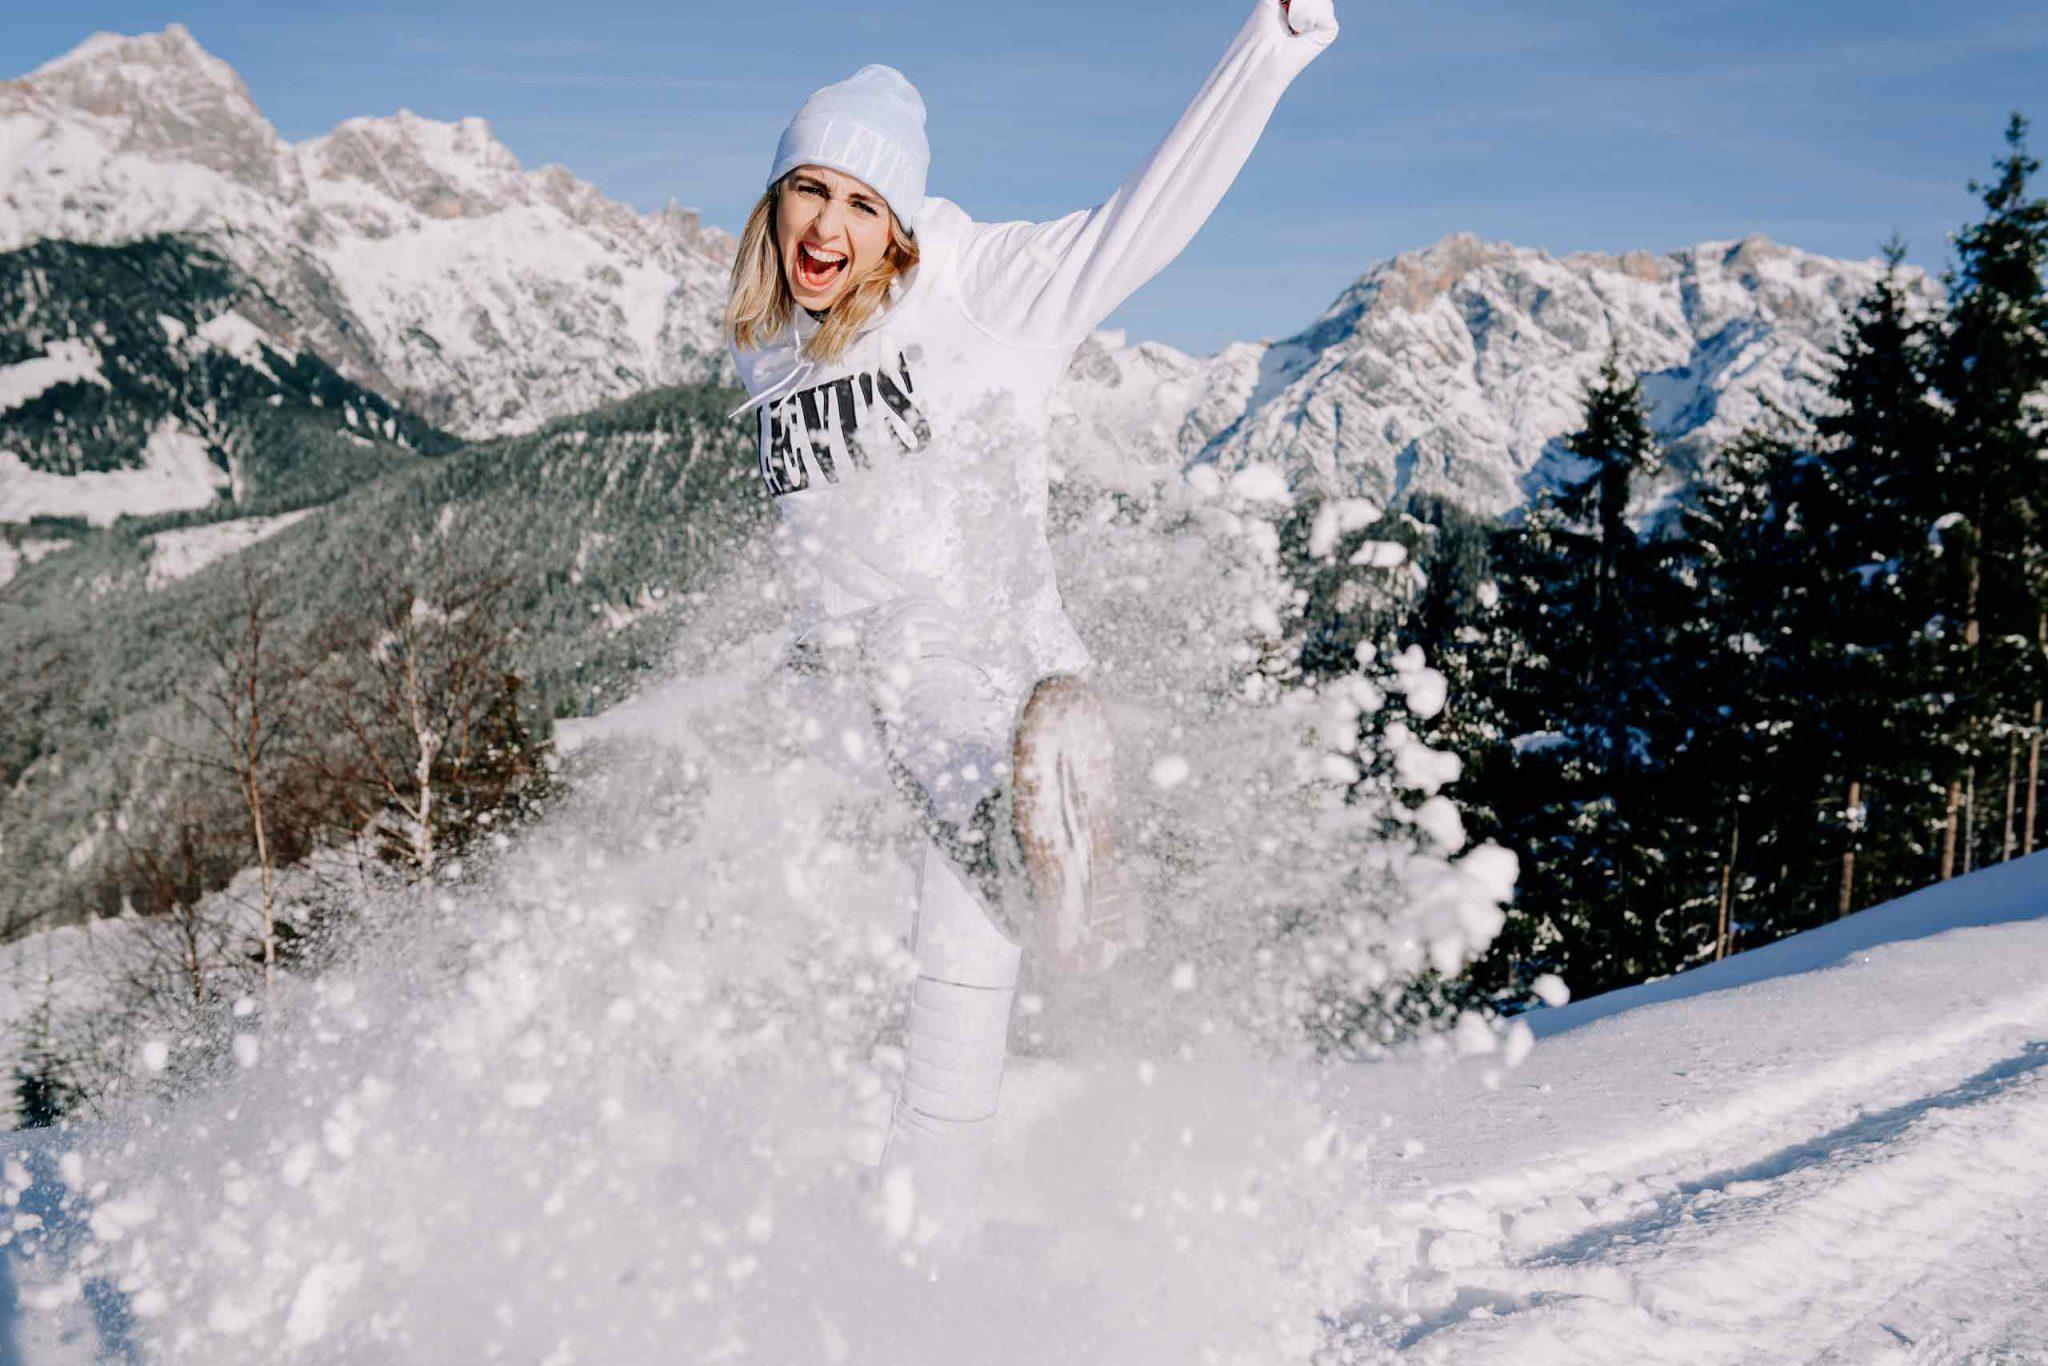 Levis_Austria_Ski_Trip_Ilsoo_van_Dijk_ISVD_10122019-03140